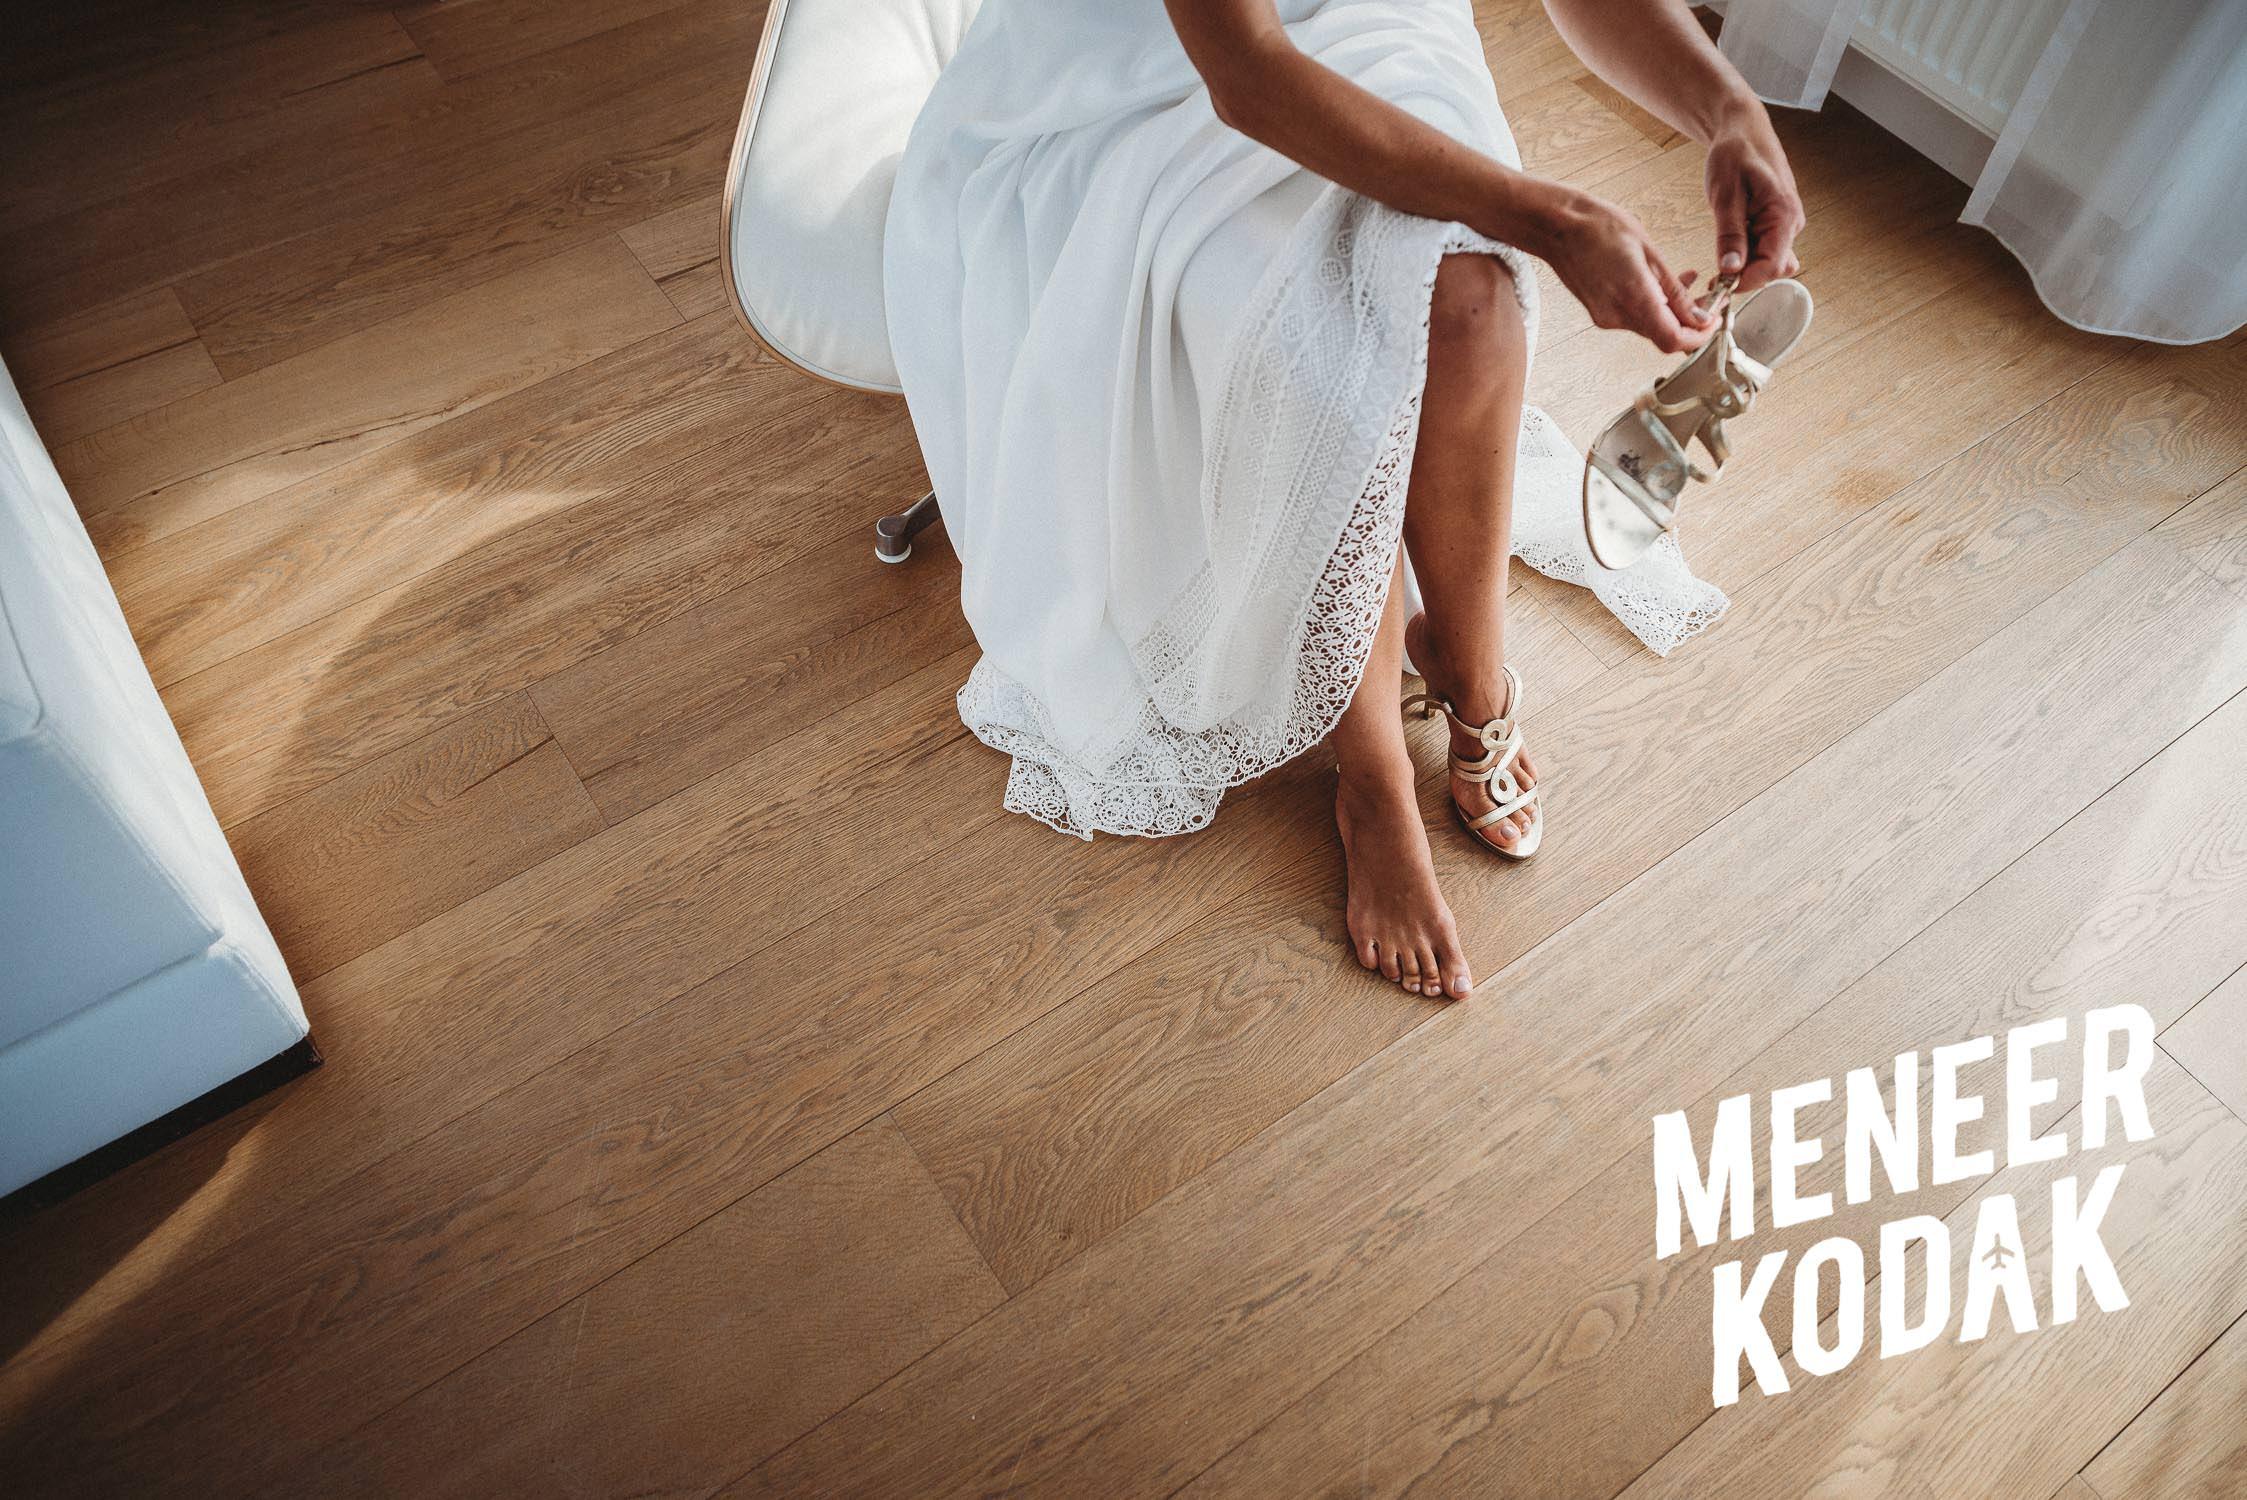 Meneer Kodak - Strandbruiloft - Noordwijk - K&A-065.jpg